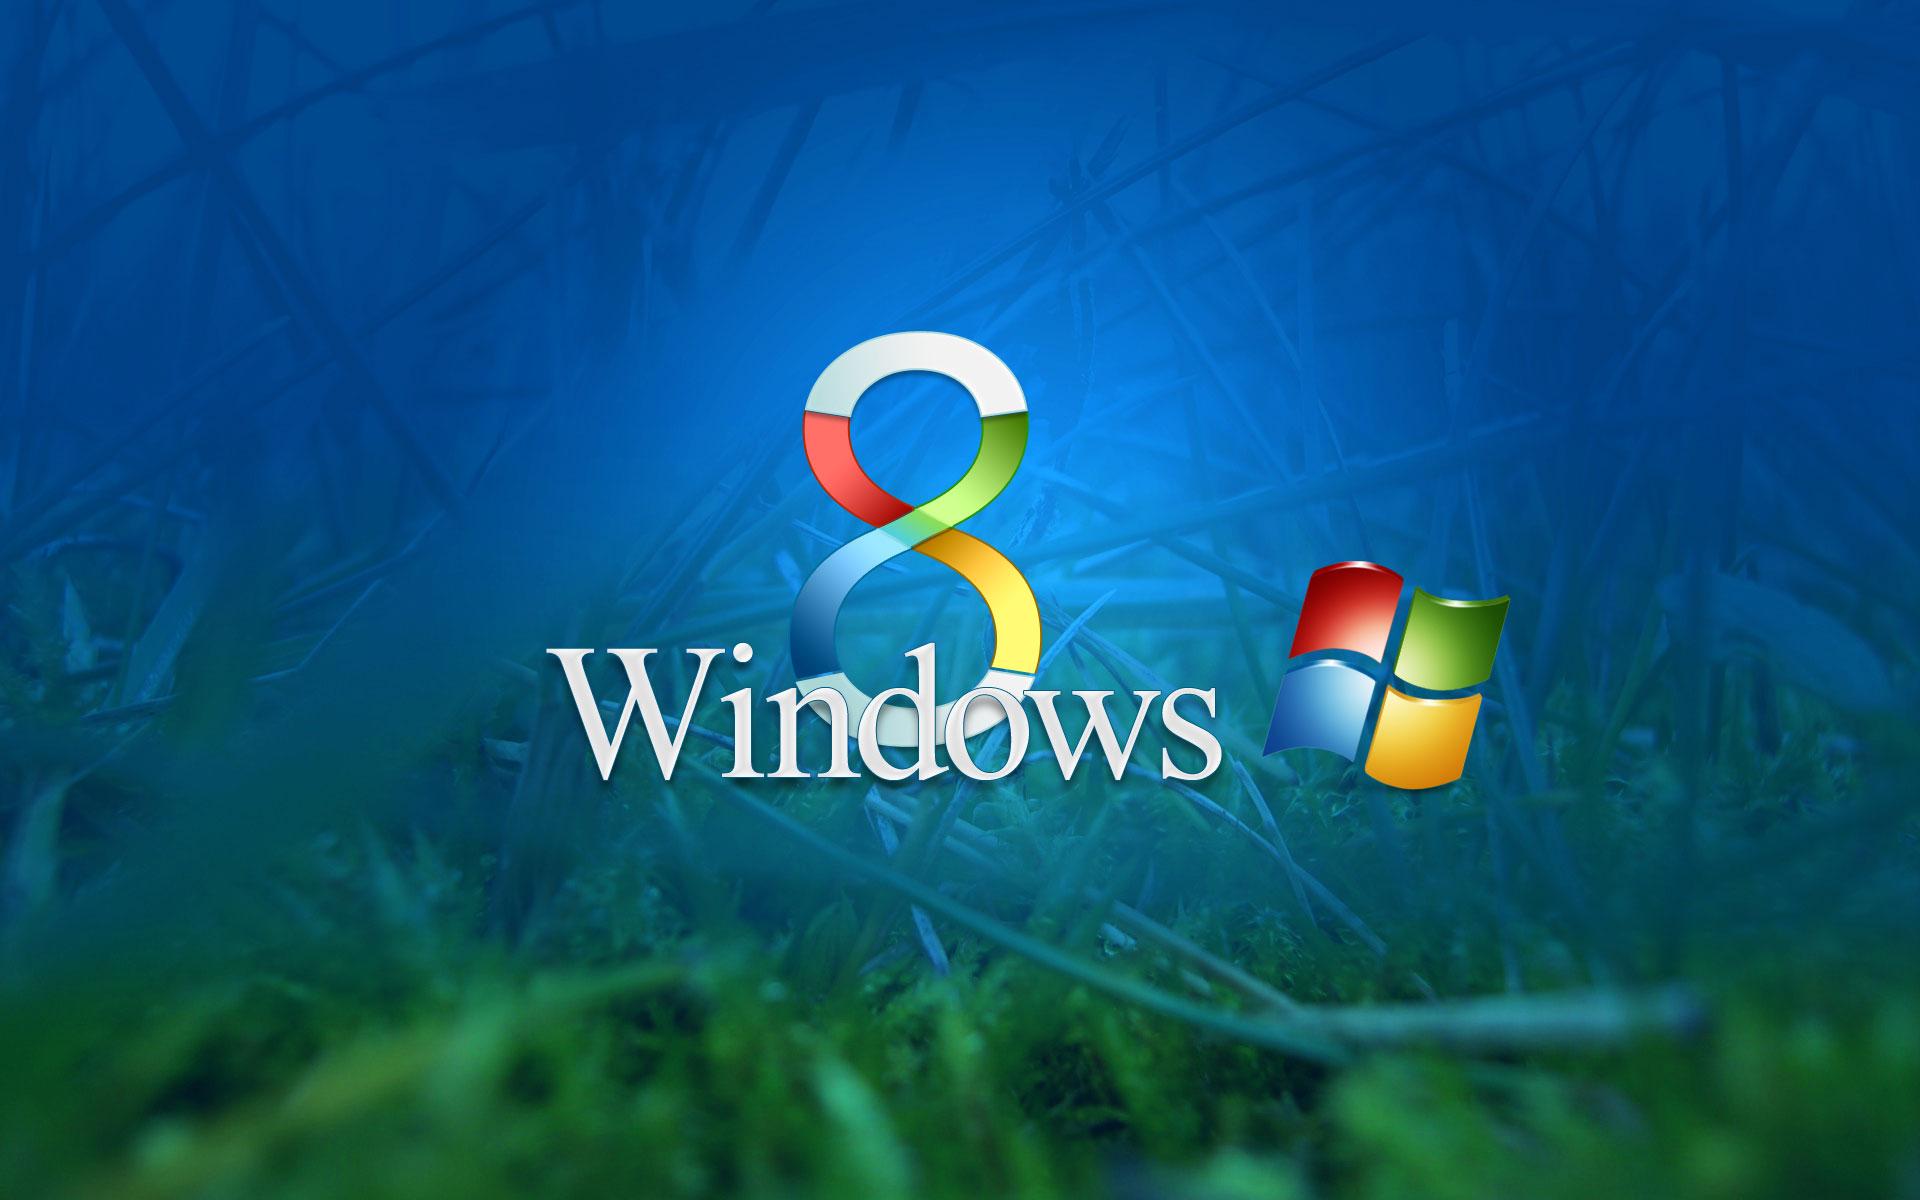 61 Wallpapers Hd For Windows 8 On Wallpapersafari